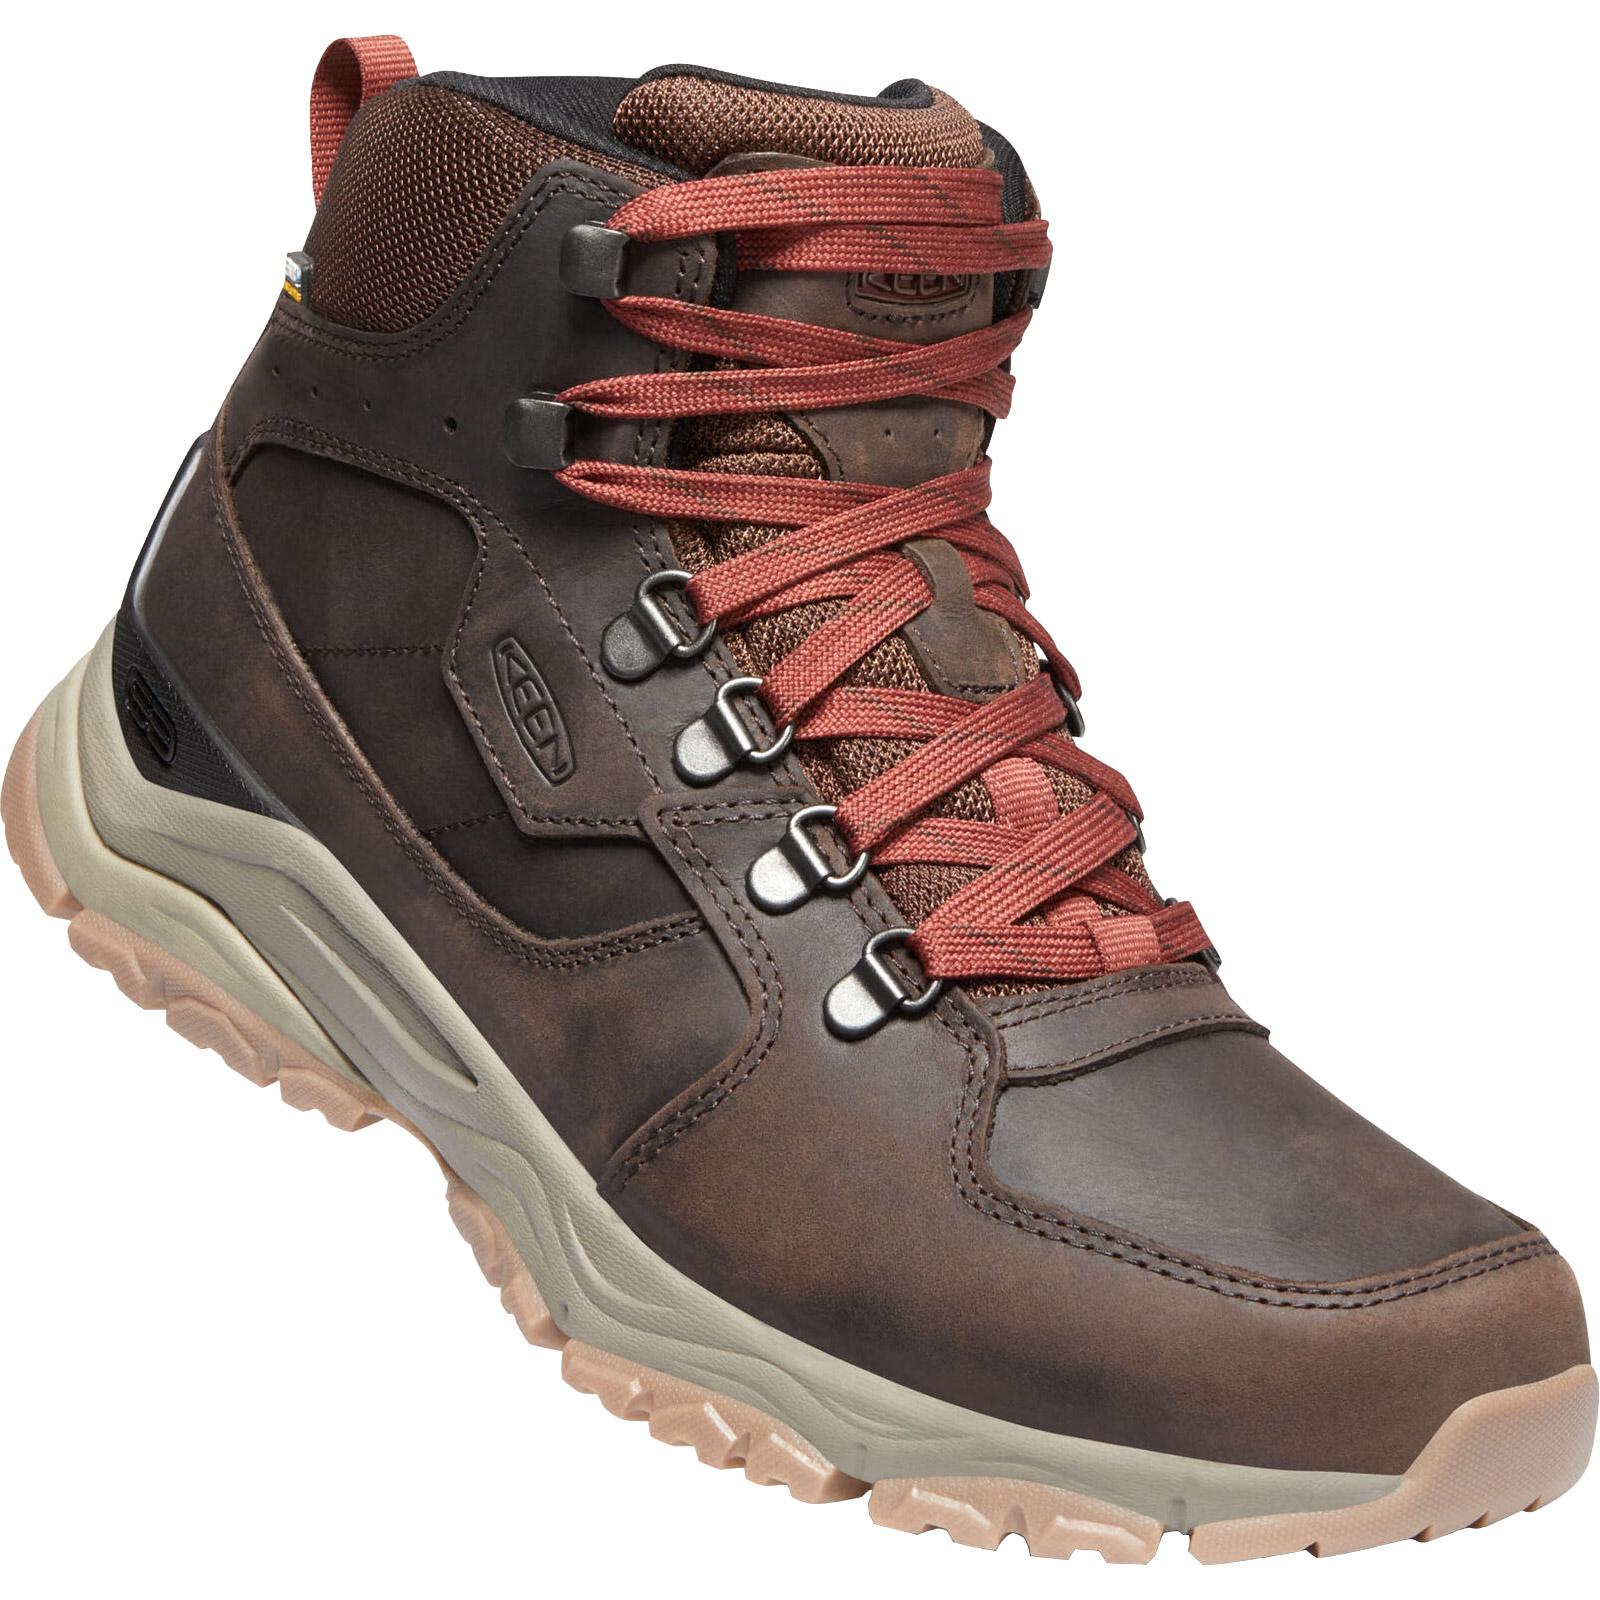 KEEN Innate Leather Mid Waterproof Men's Hiking Ankle Boot - Chestnut / Fired Brick